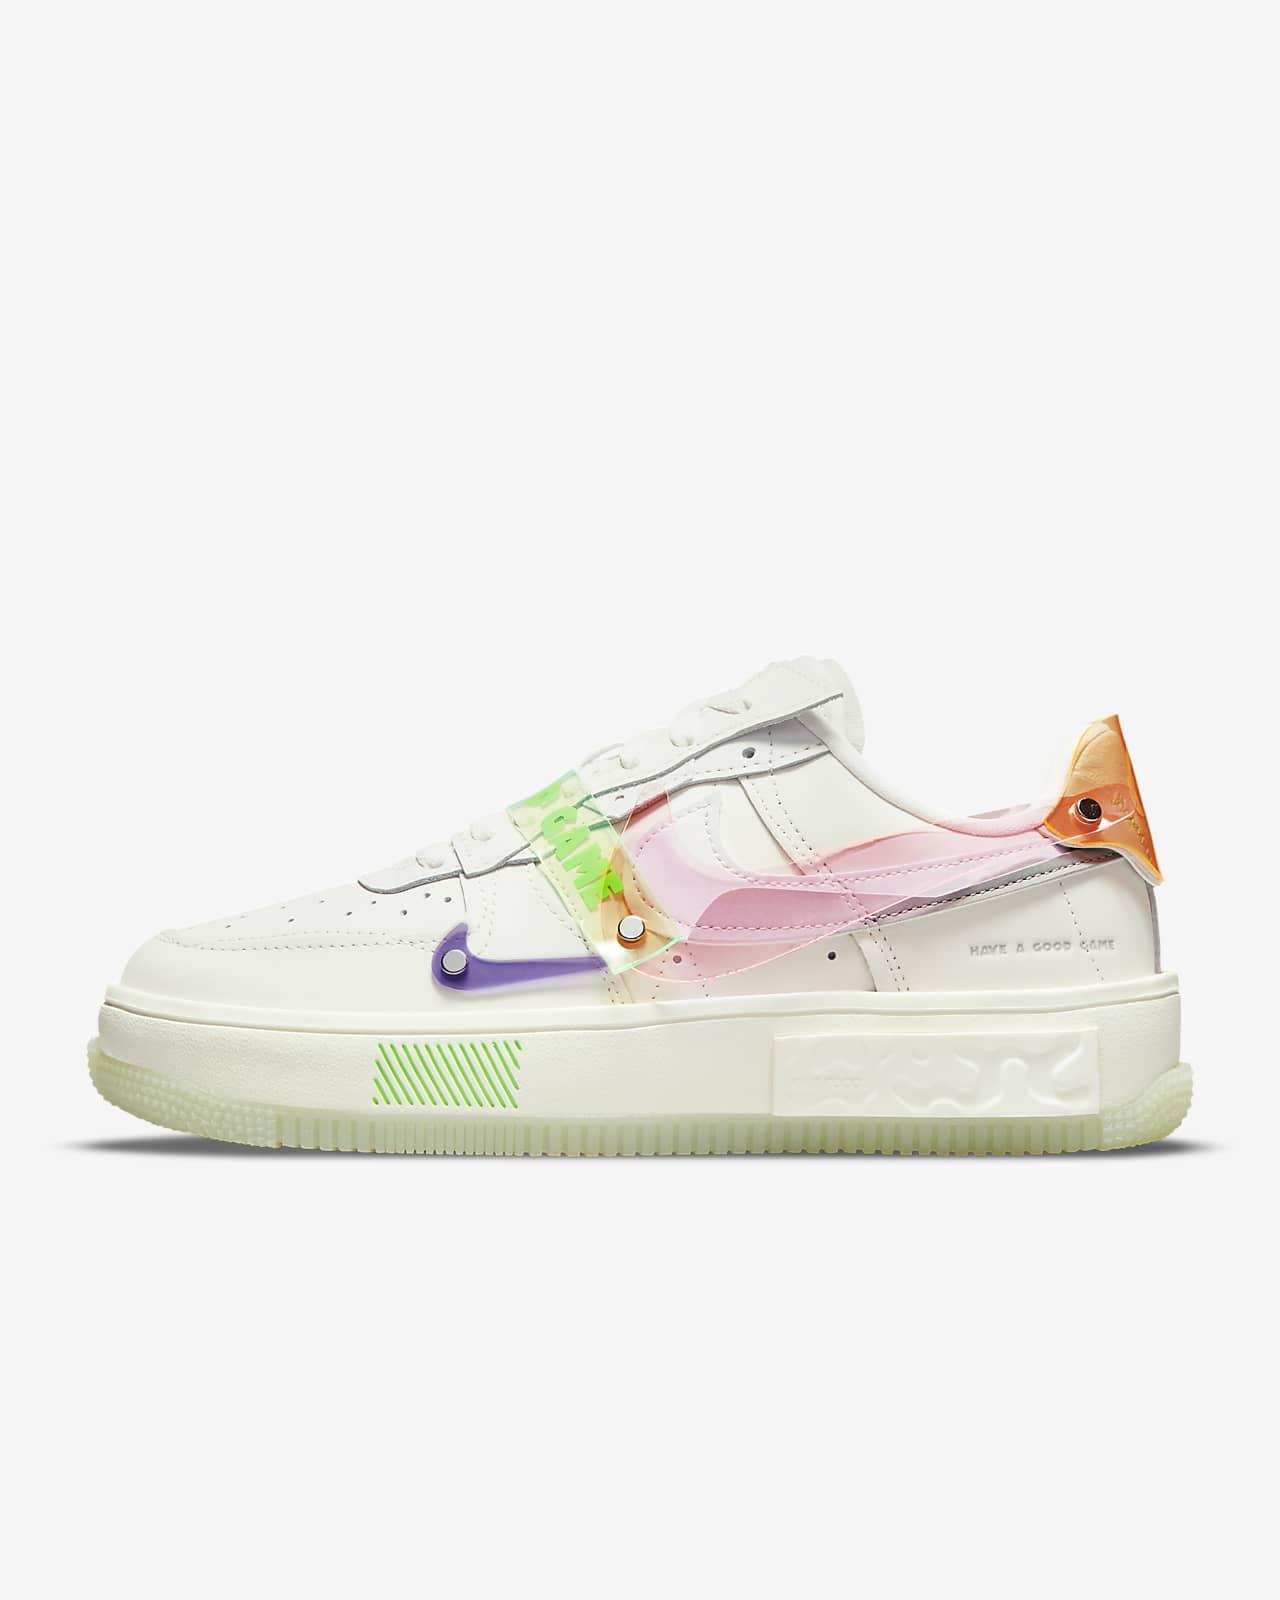 Nike Air Force 1 Fontanka 女子运动鞋